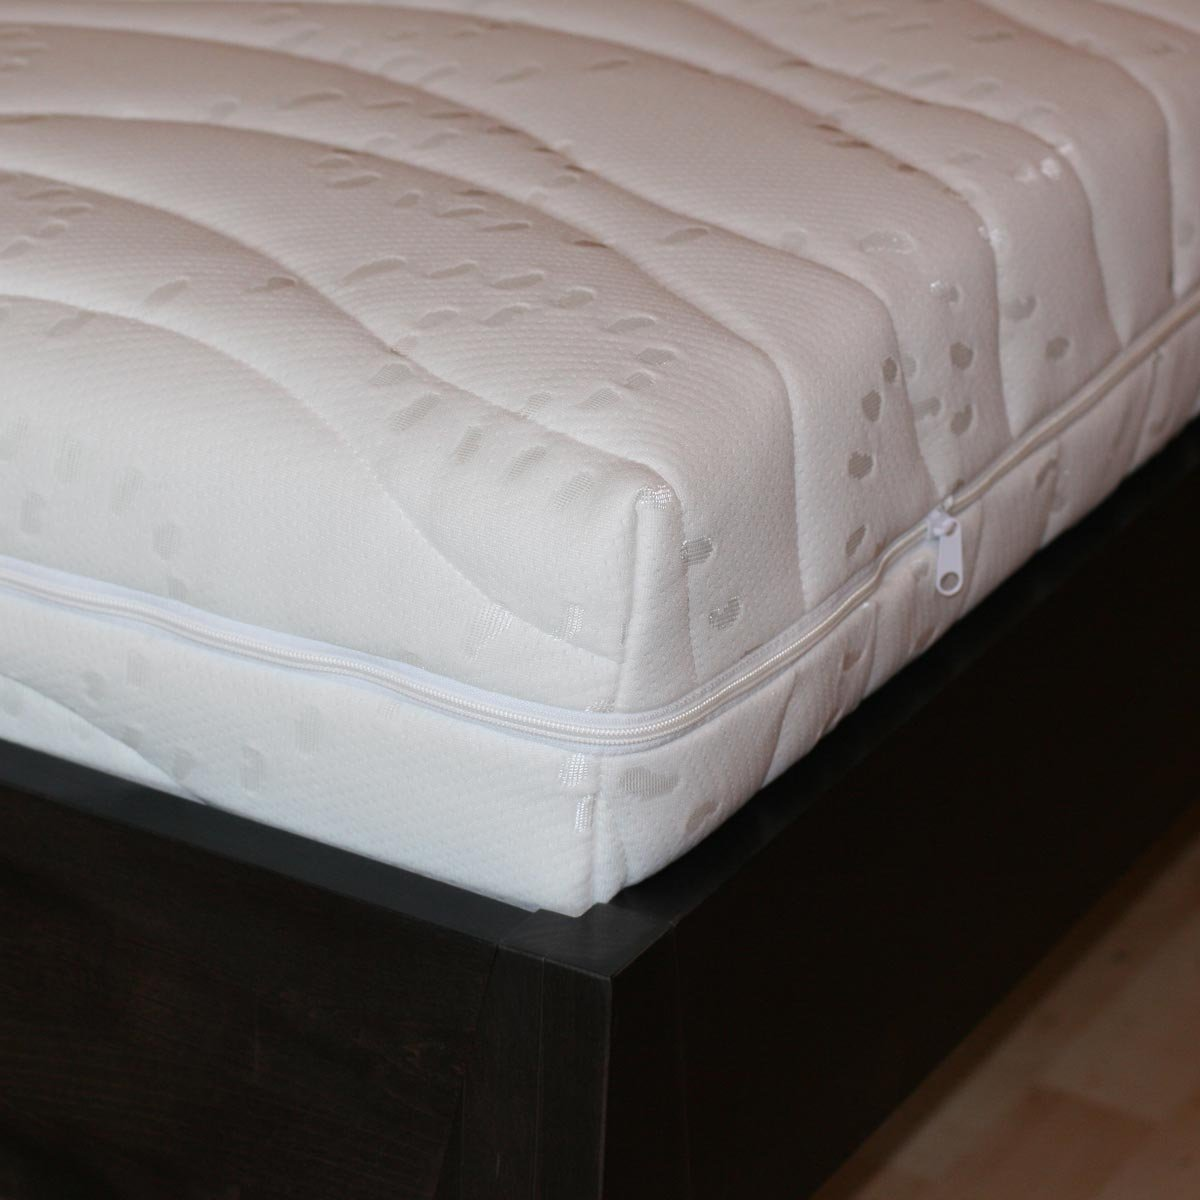 outdoor matratzenbezug. Black Bedroom Furniture Sets. Home Design Ideas